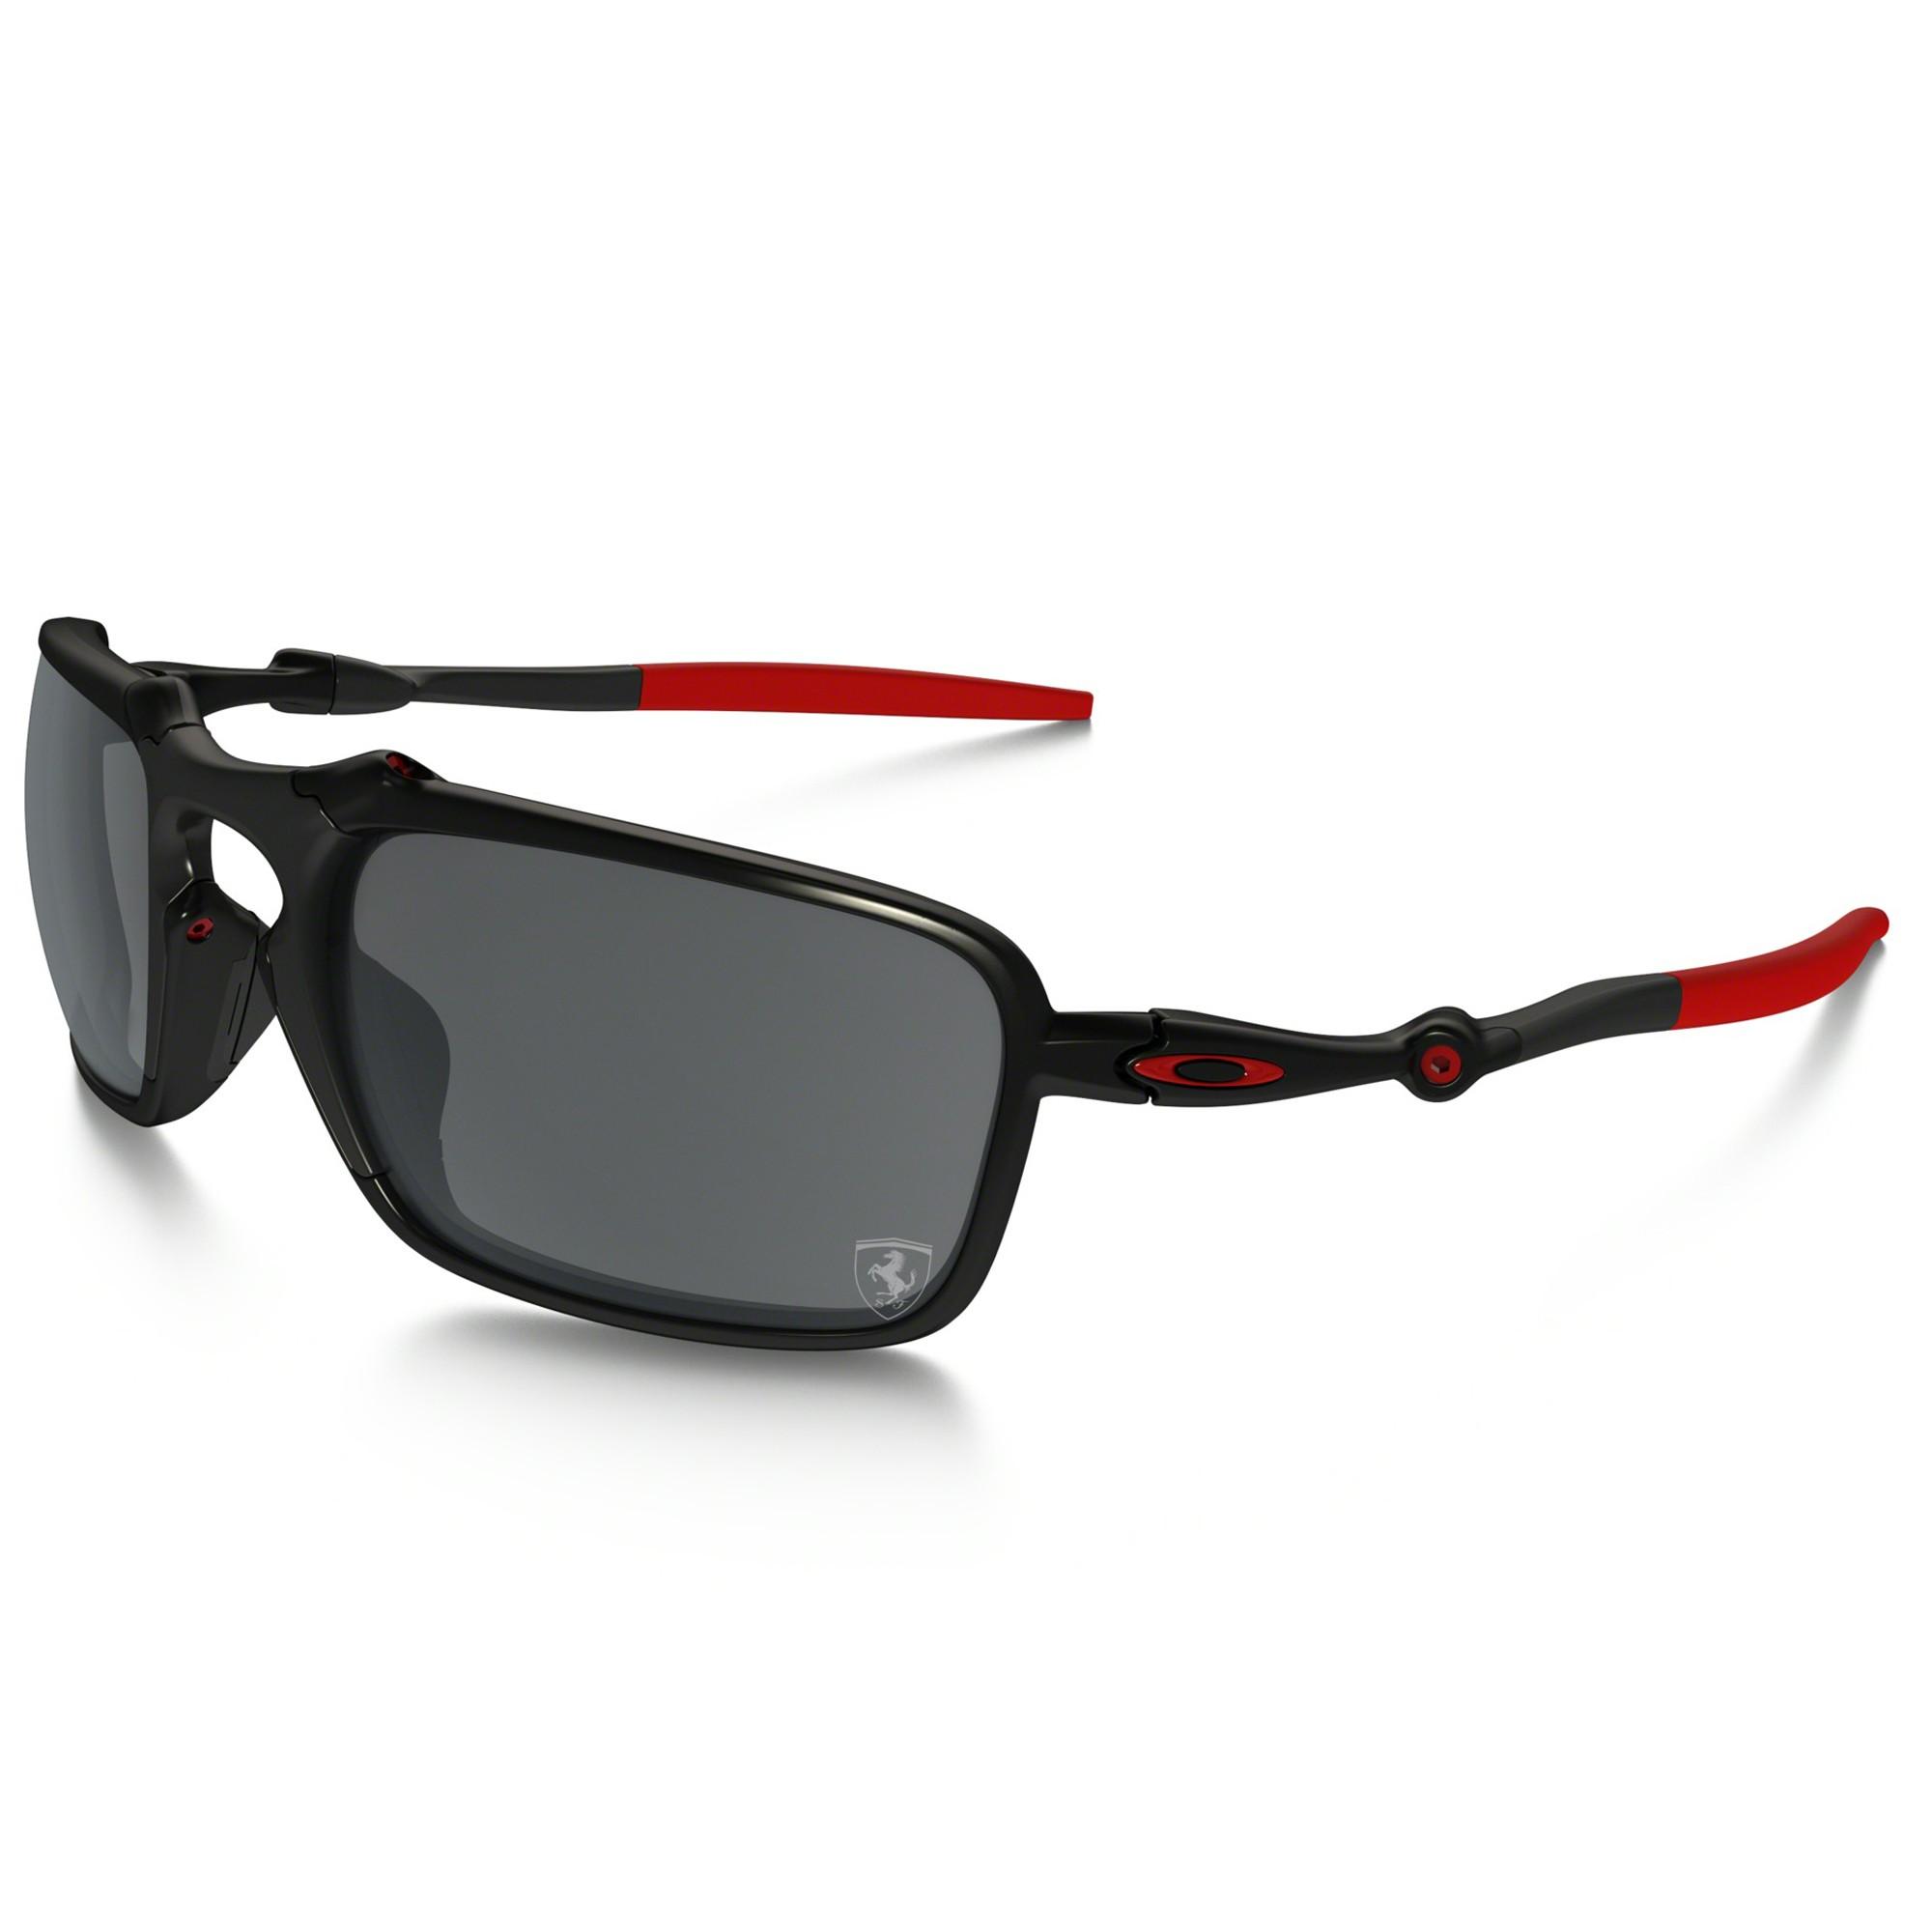 responsive sunglasses itm men for plasma tungsten details about polarized ferrari iridium oakley man image mad